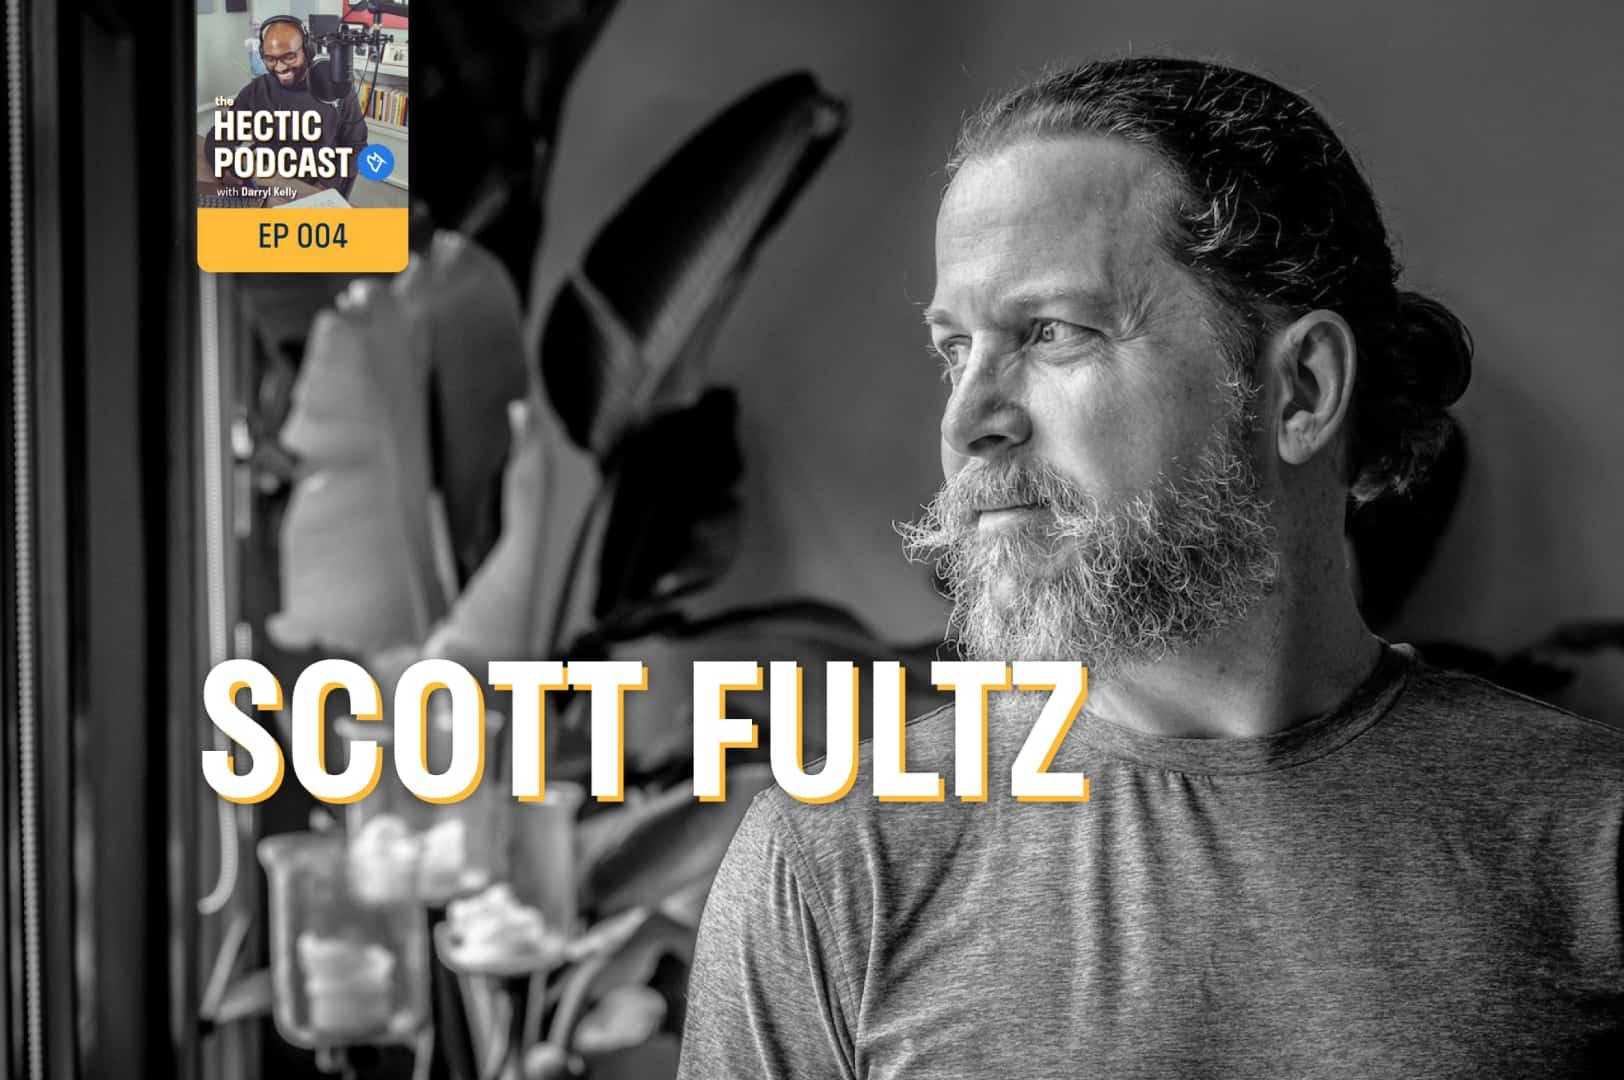 Scott Fultz